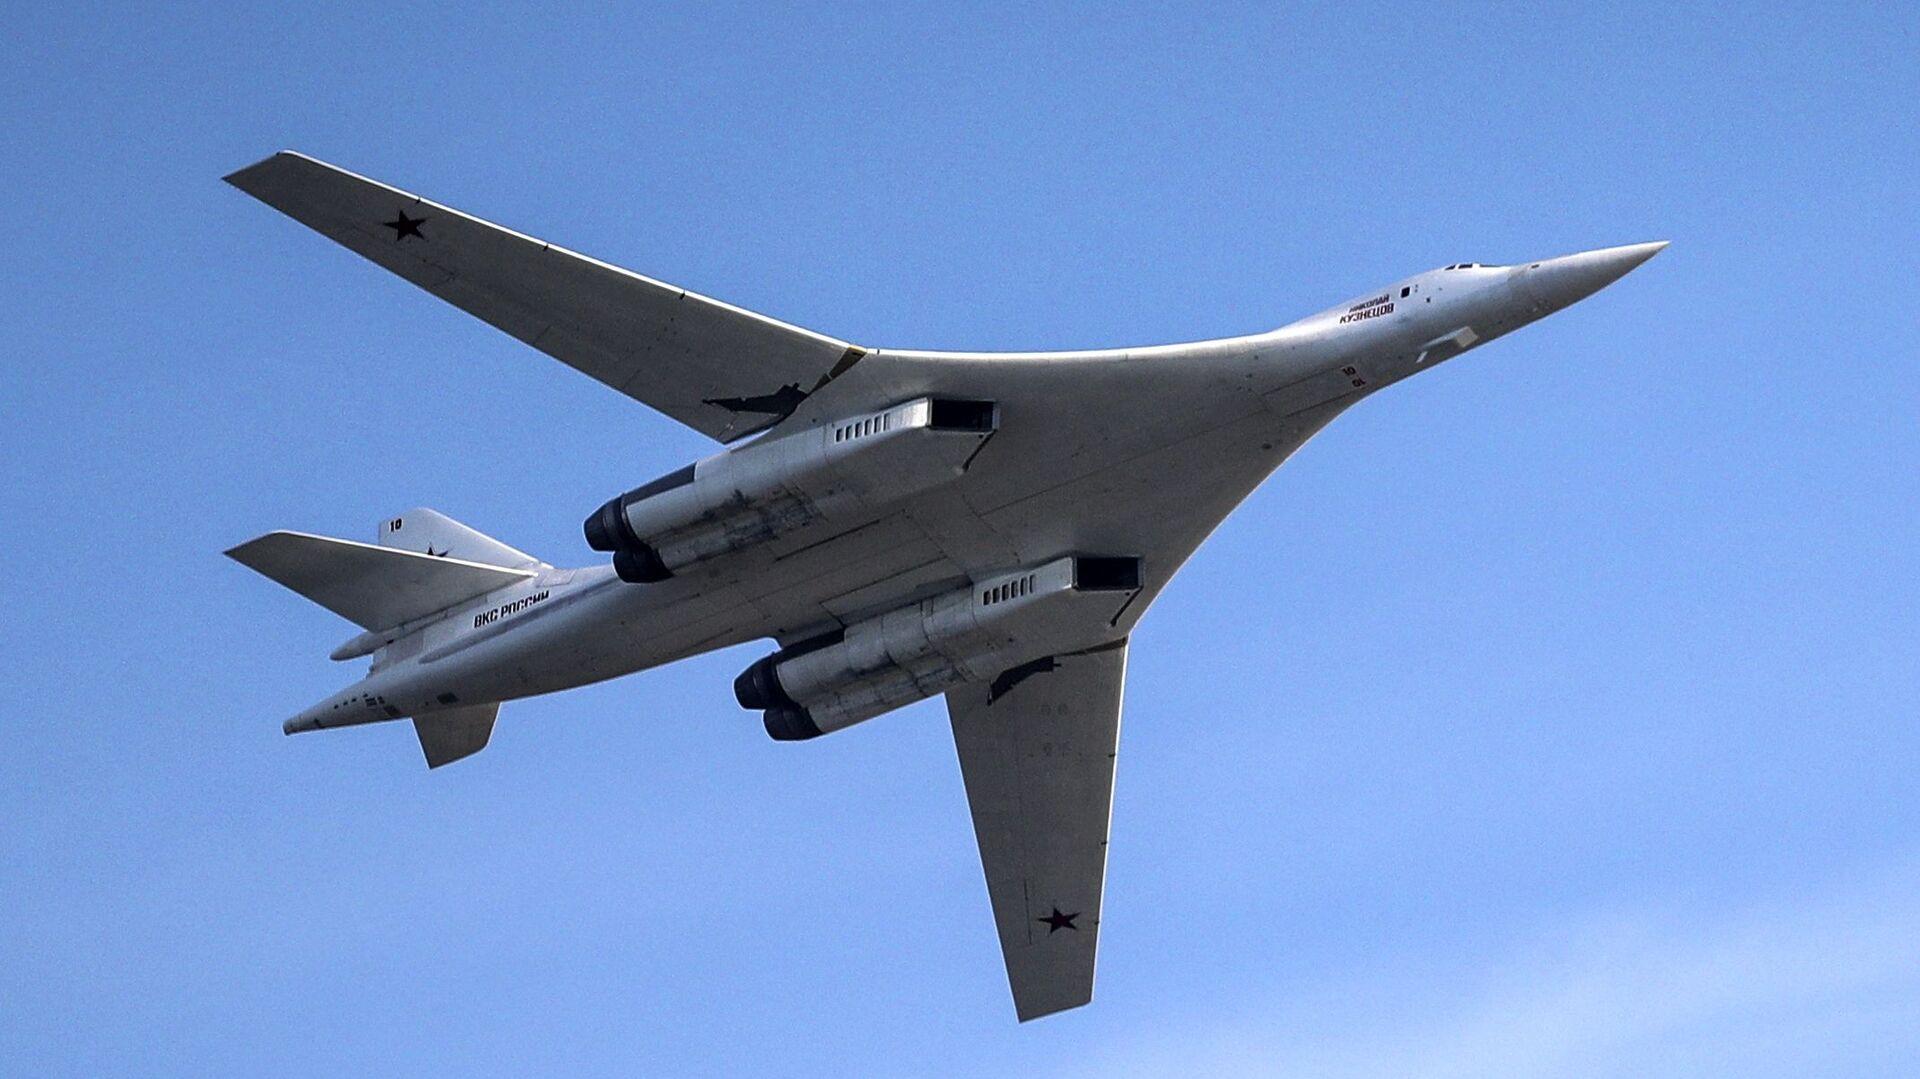 Бомбардировщик-ракетоносец Ту-160 - Sputnik Латвия, 1920, 21.09.2021